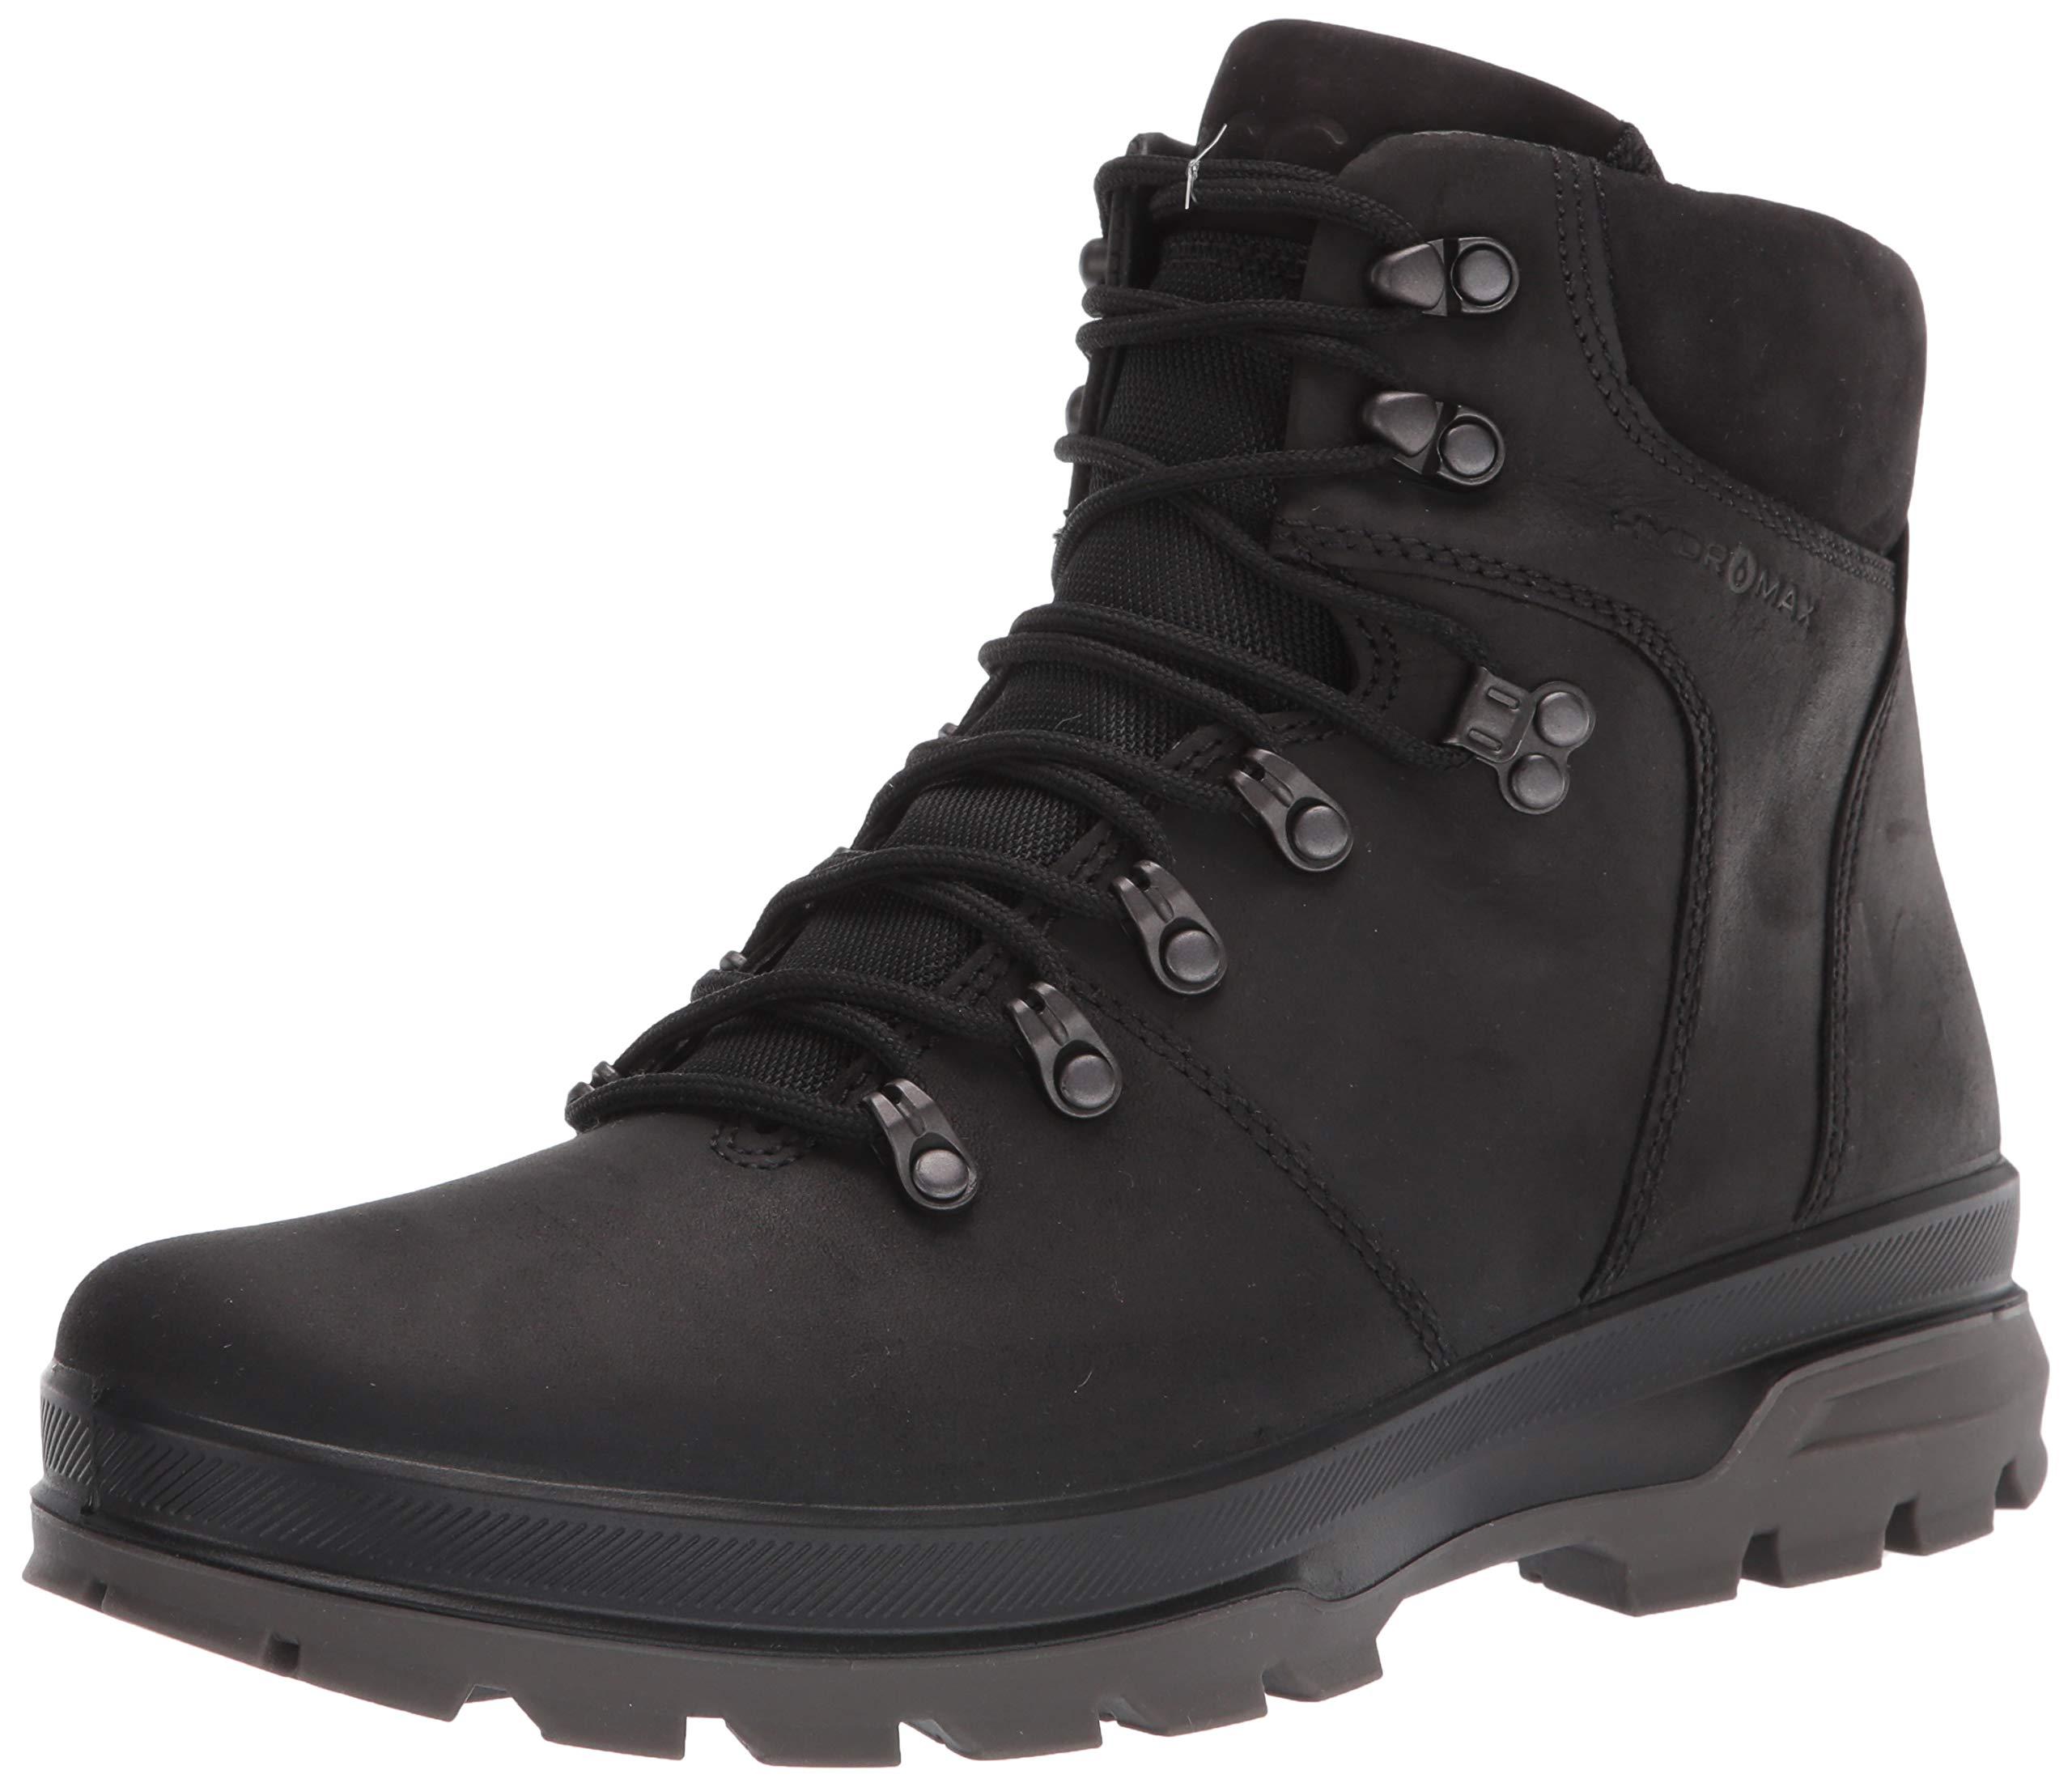 ECCO Men's Rugged Track High Hydromax Hiking Shoe